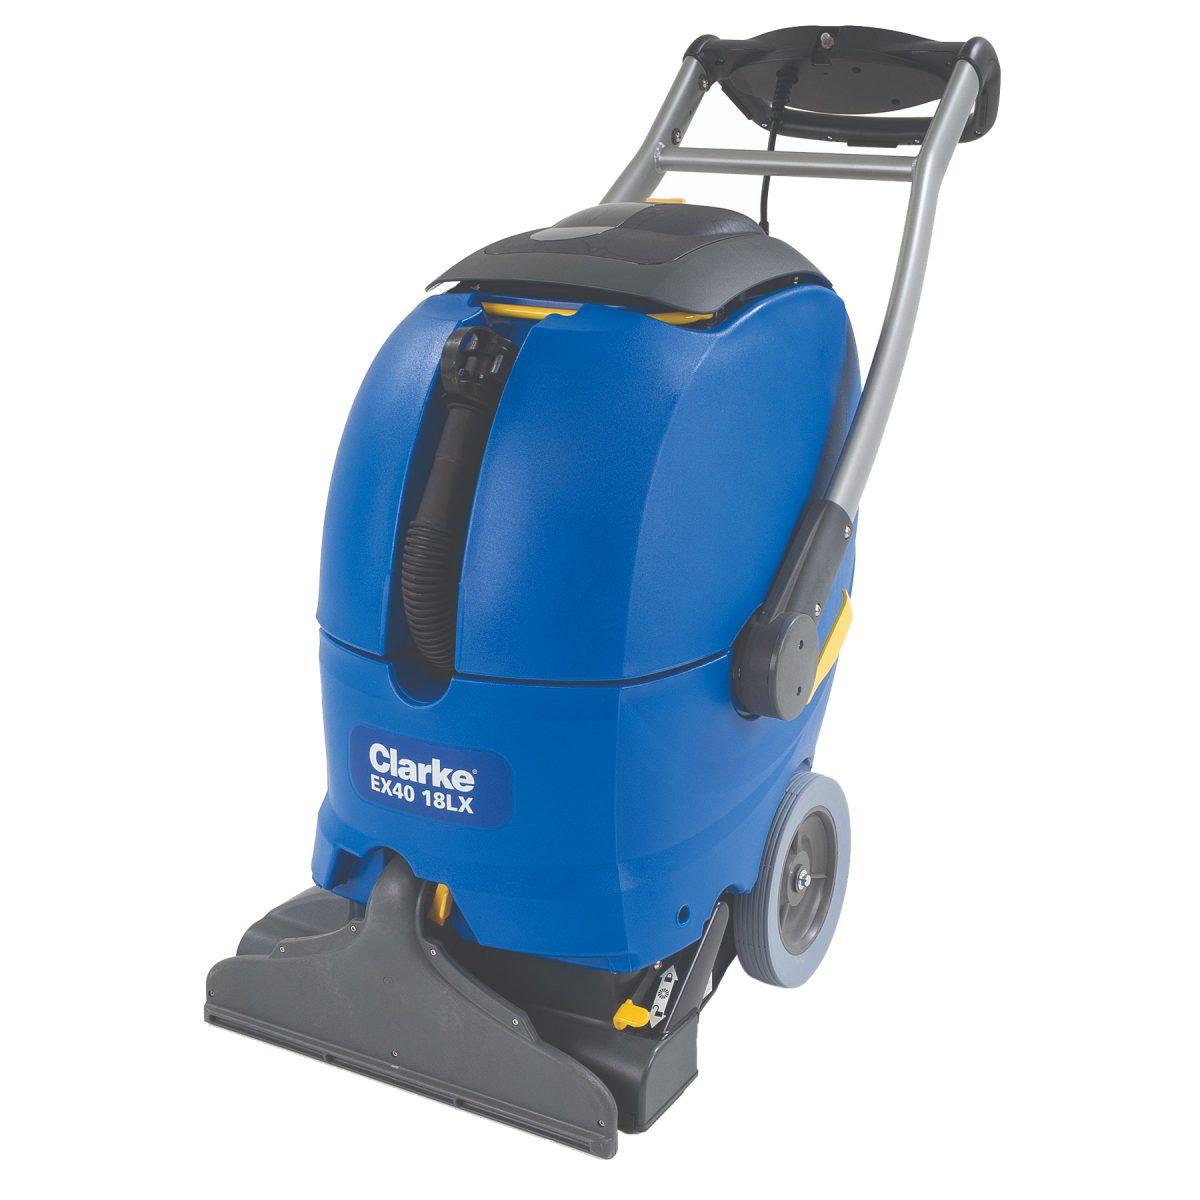 Clarke EX40 18LX Carpet Extractor